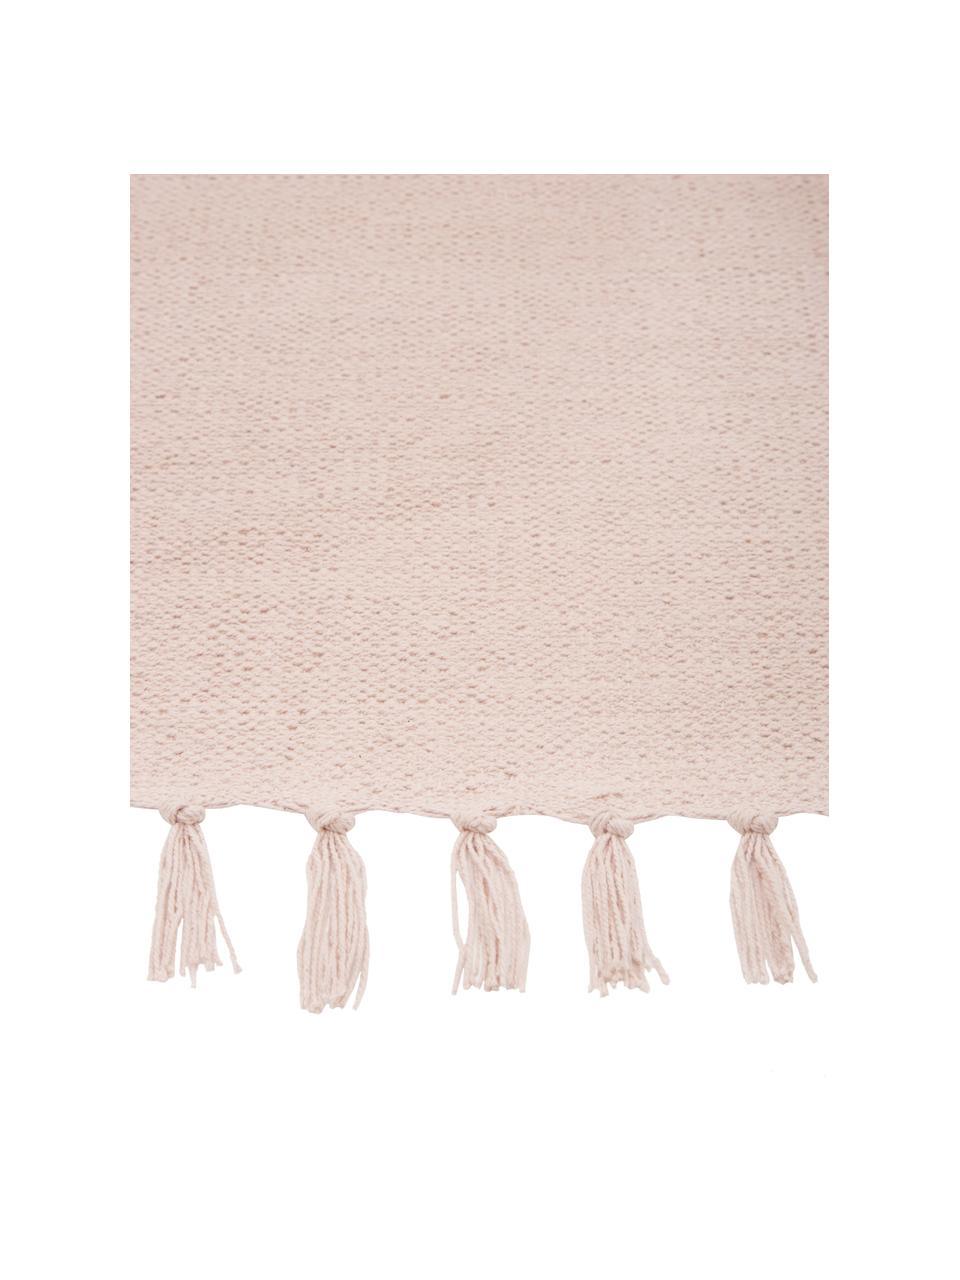 Dünner Baumwollteppich Agneta in Rosa, handgewebt, 100% Baumwolle, Rosa, B 200 x L 300 cm (Größe L)